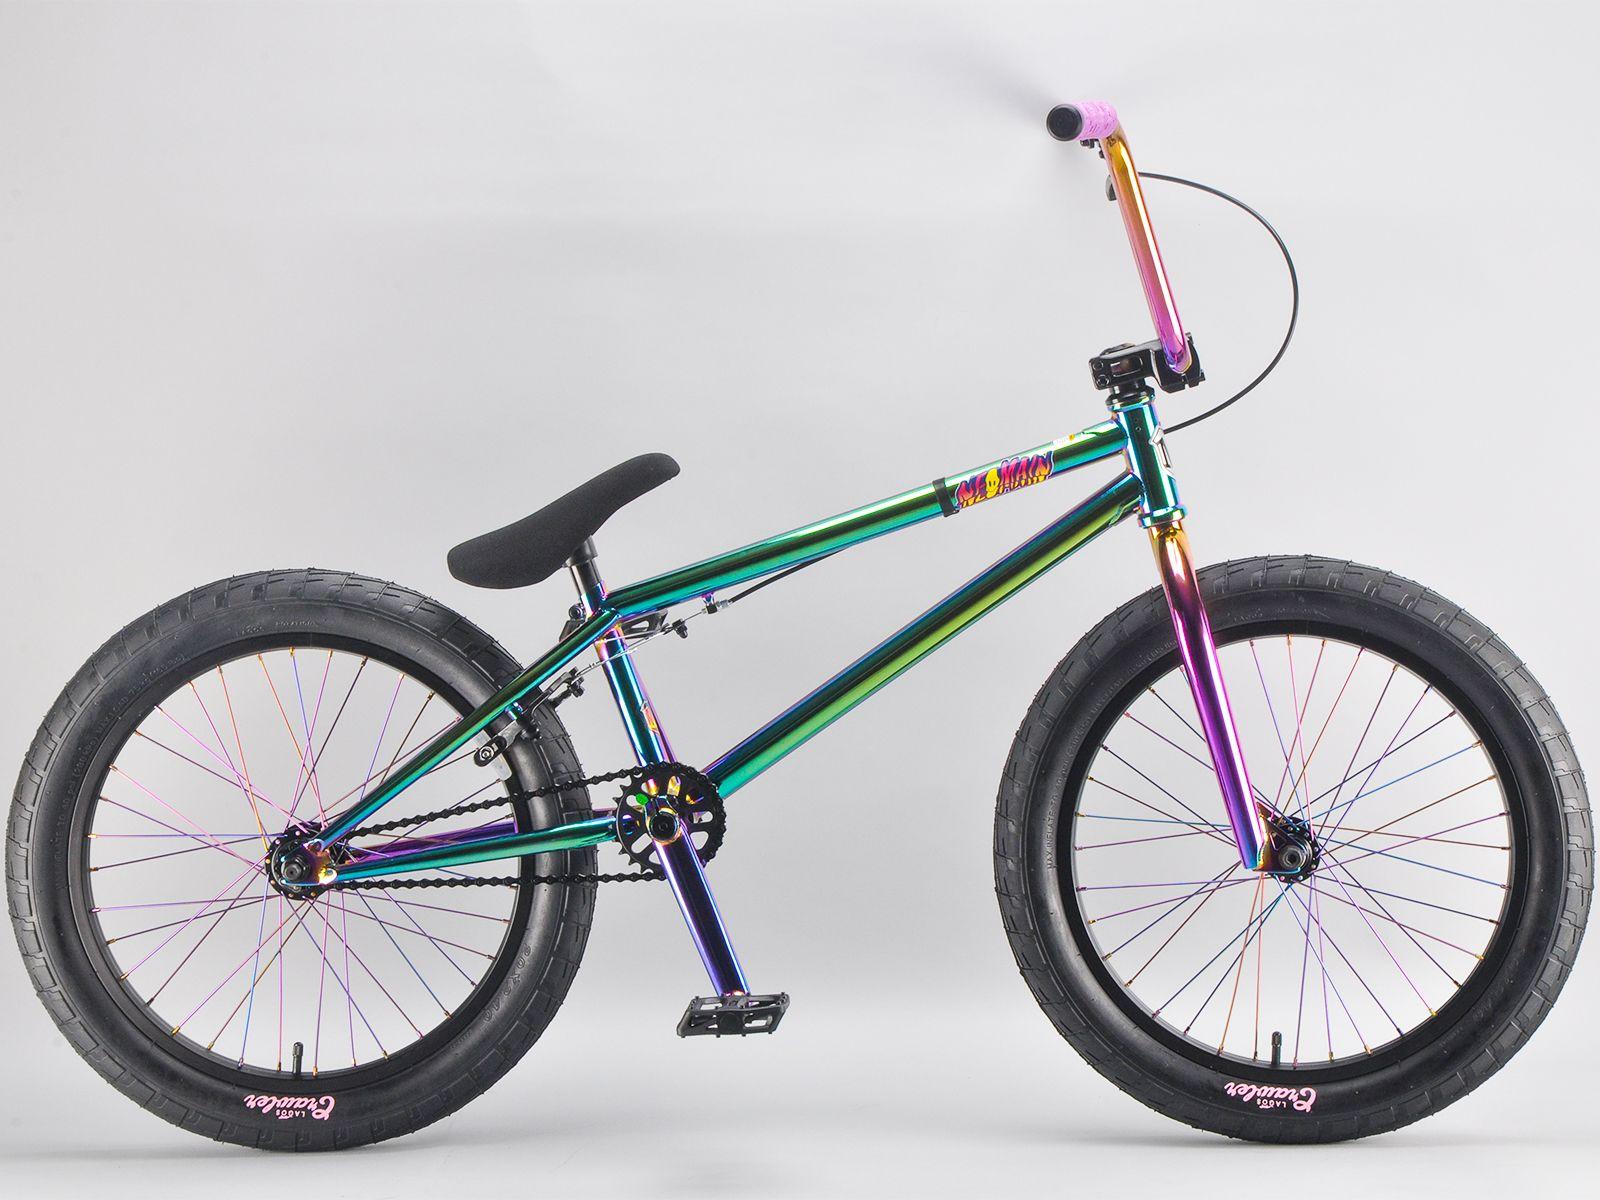 Neomain 20 Inch Bmx Bike Bmx Bikes Stunt Bike Best Bmx